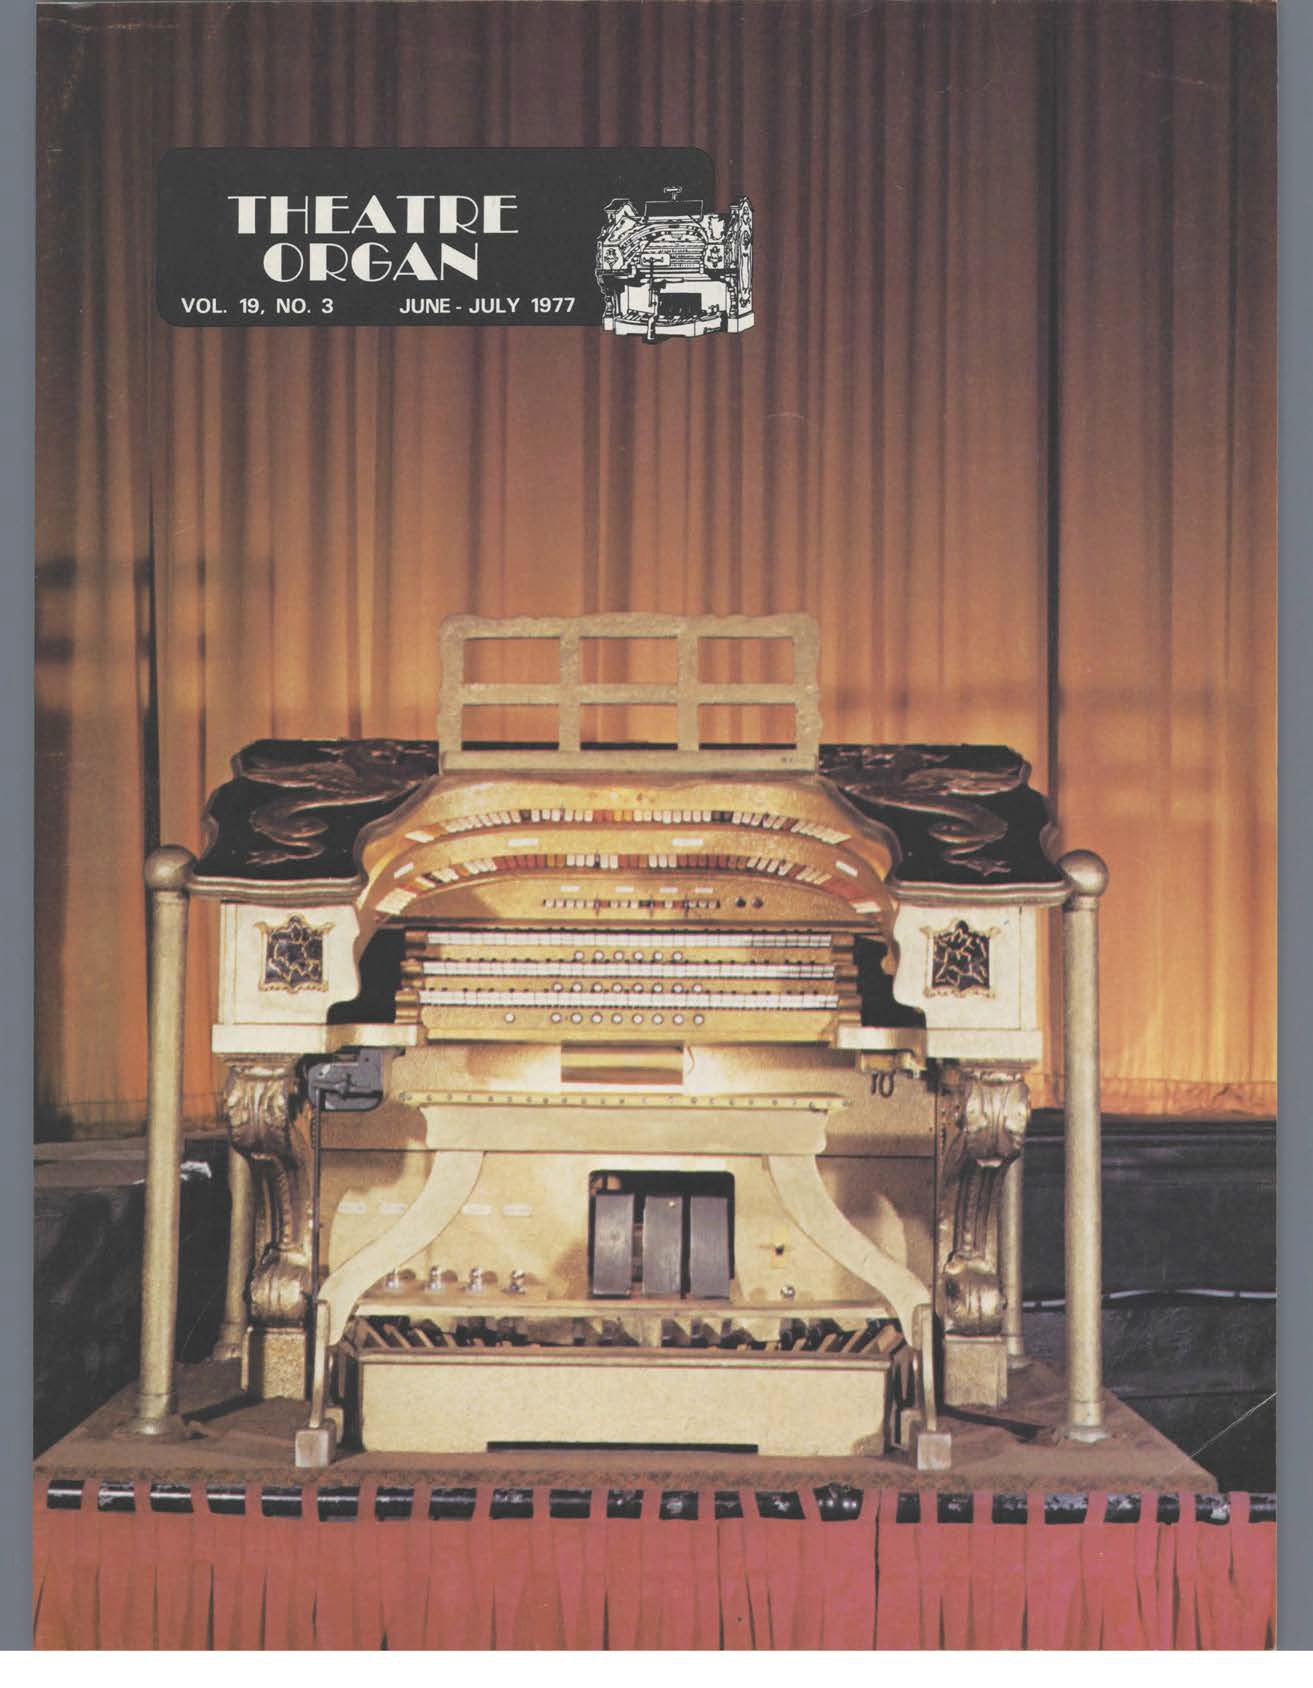 Theatre Organ, June - July 1977, Volume 19, Number 3